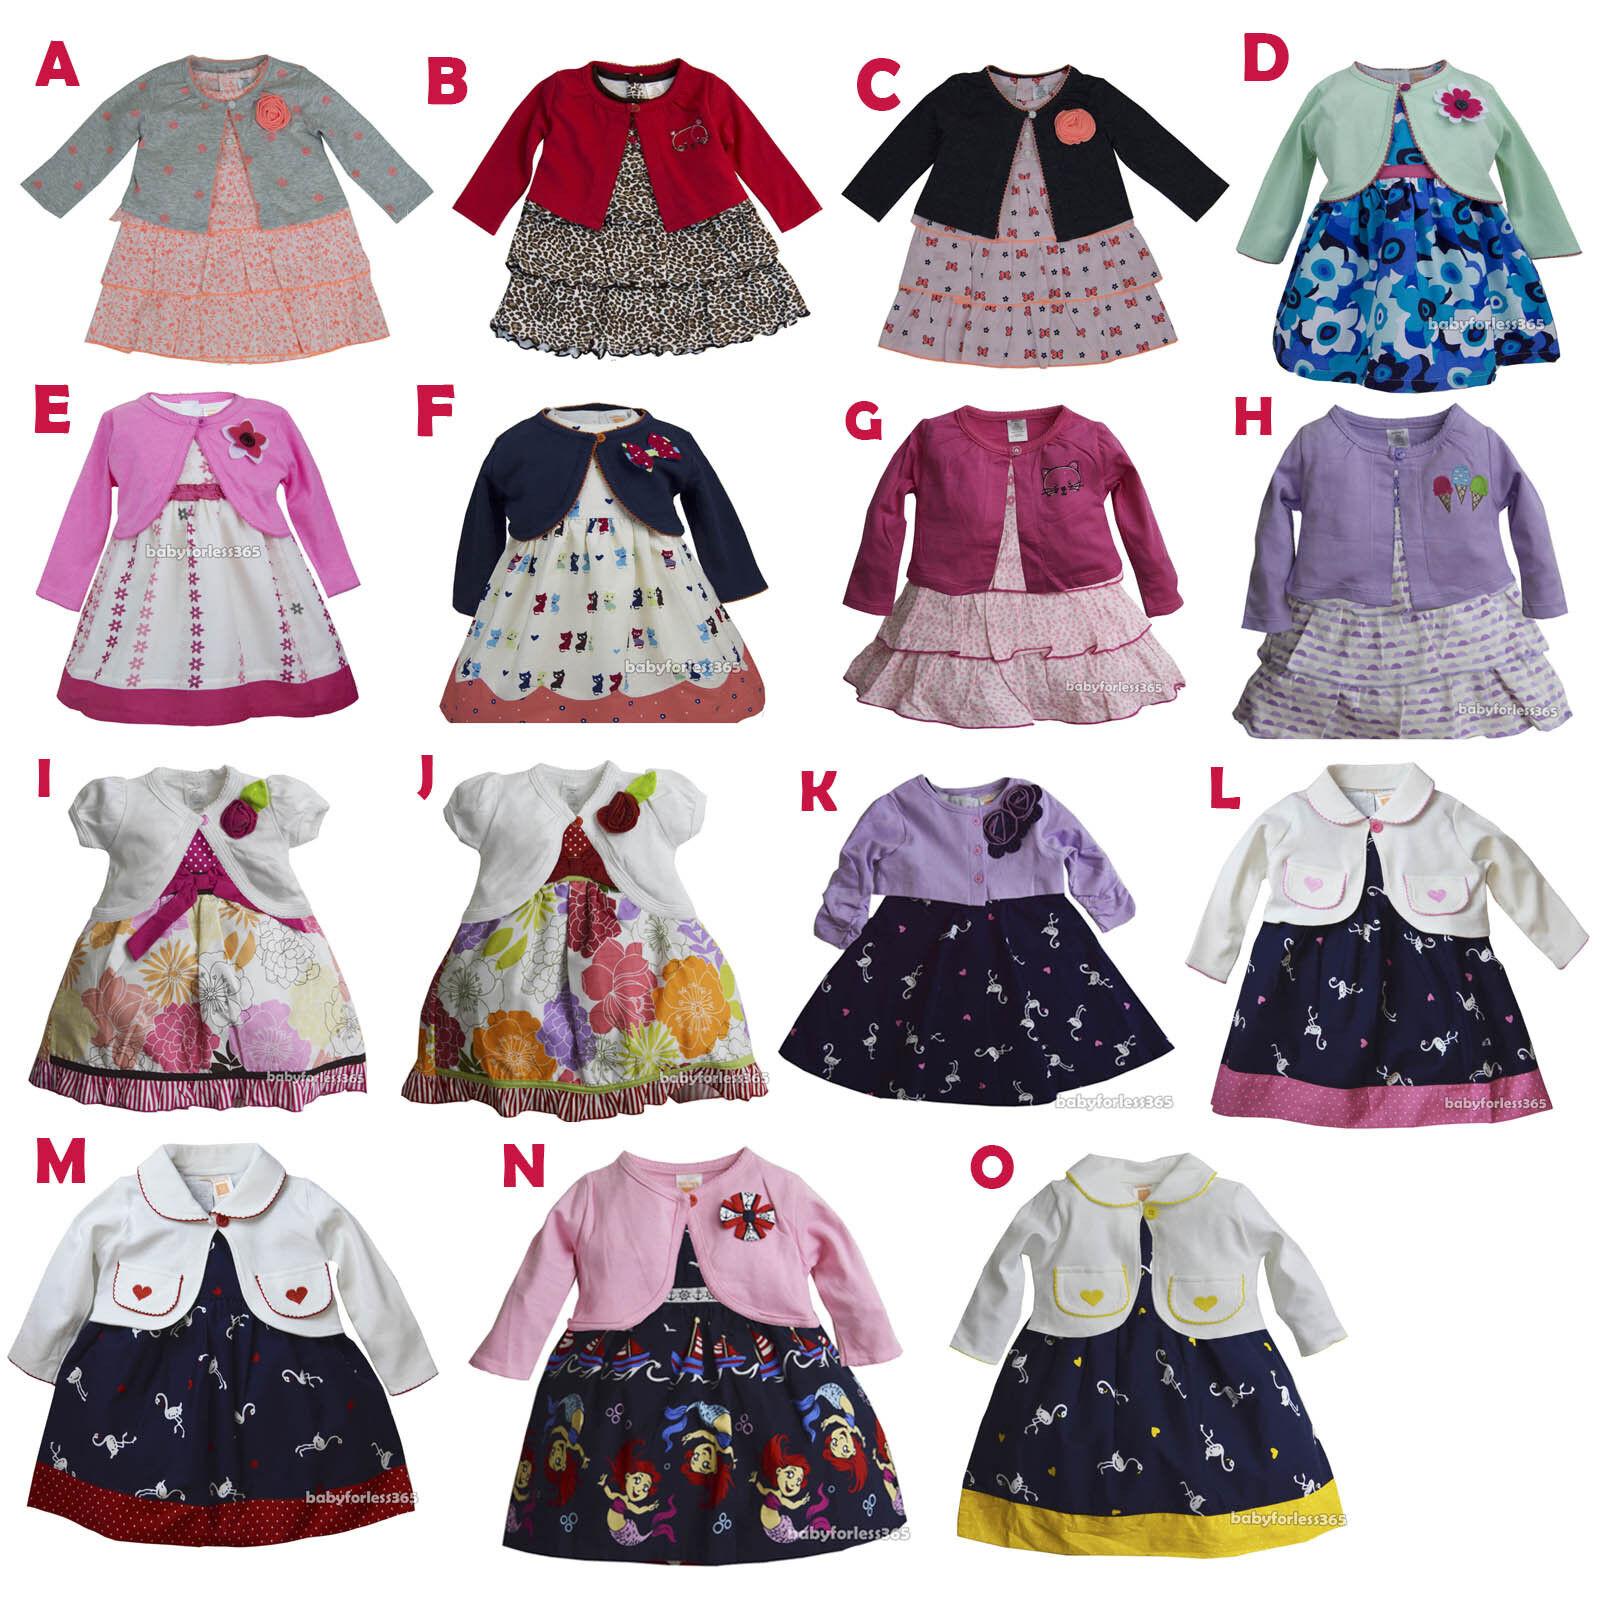 New Ashley/'s Baby Girls 3 pieces Cardigan Shirt Legging Size 12 18 24 months